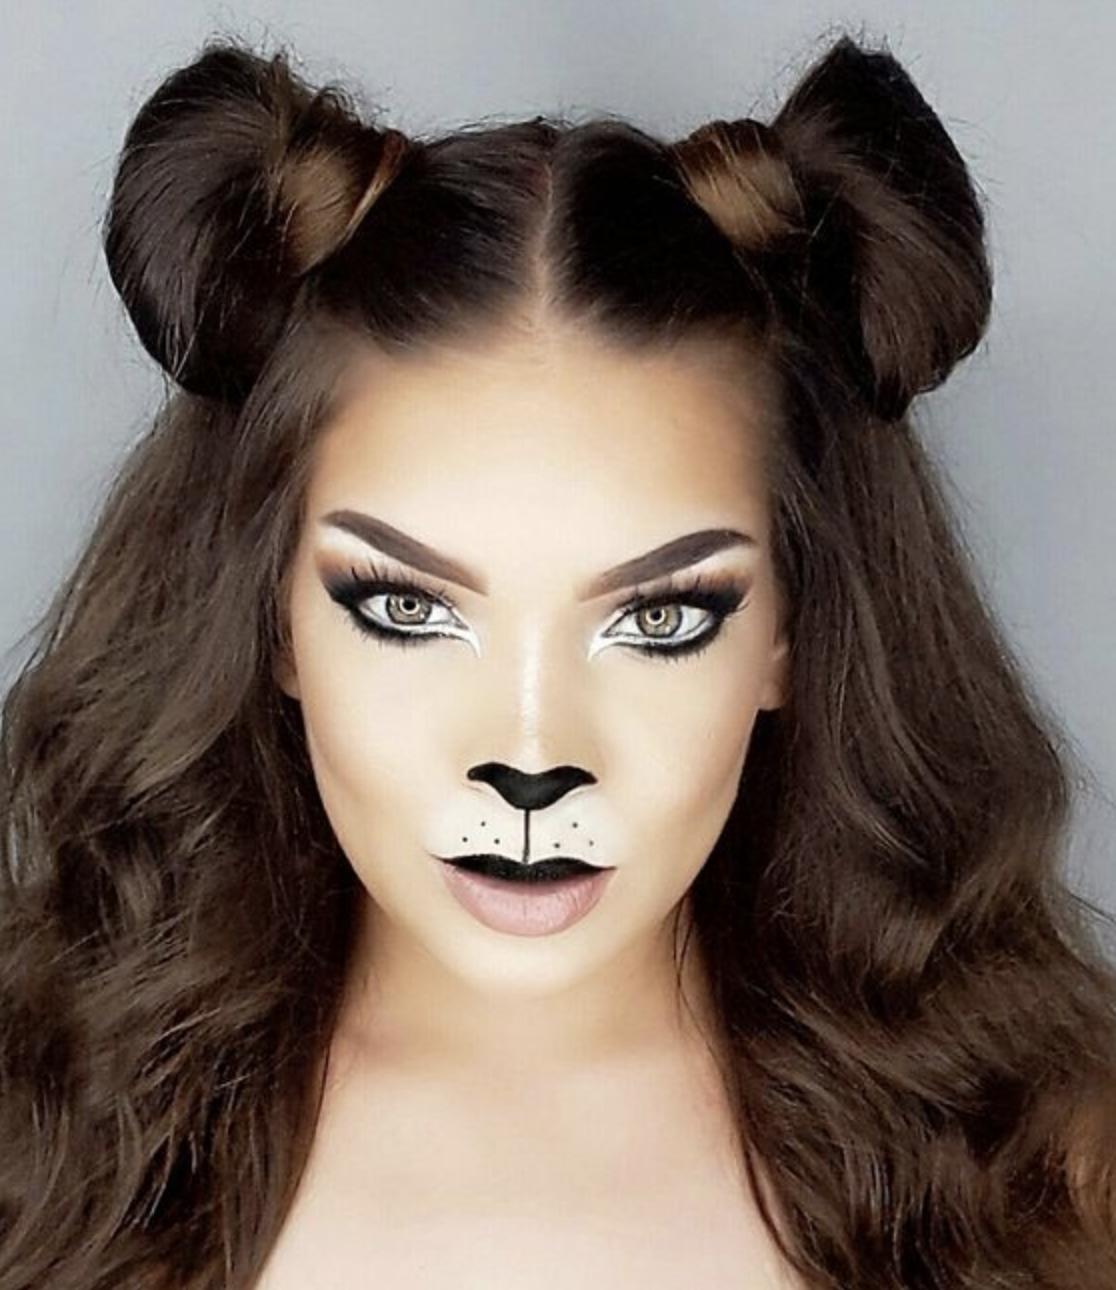 Halloween 2020 Animales Makeup 13 Easy Halloween Makeup Ideas to Try in 2020 | Cute halloween